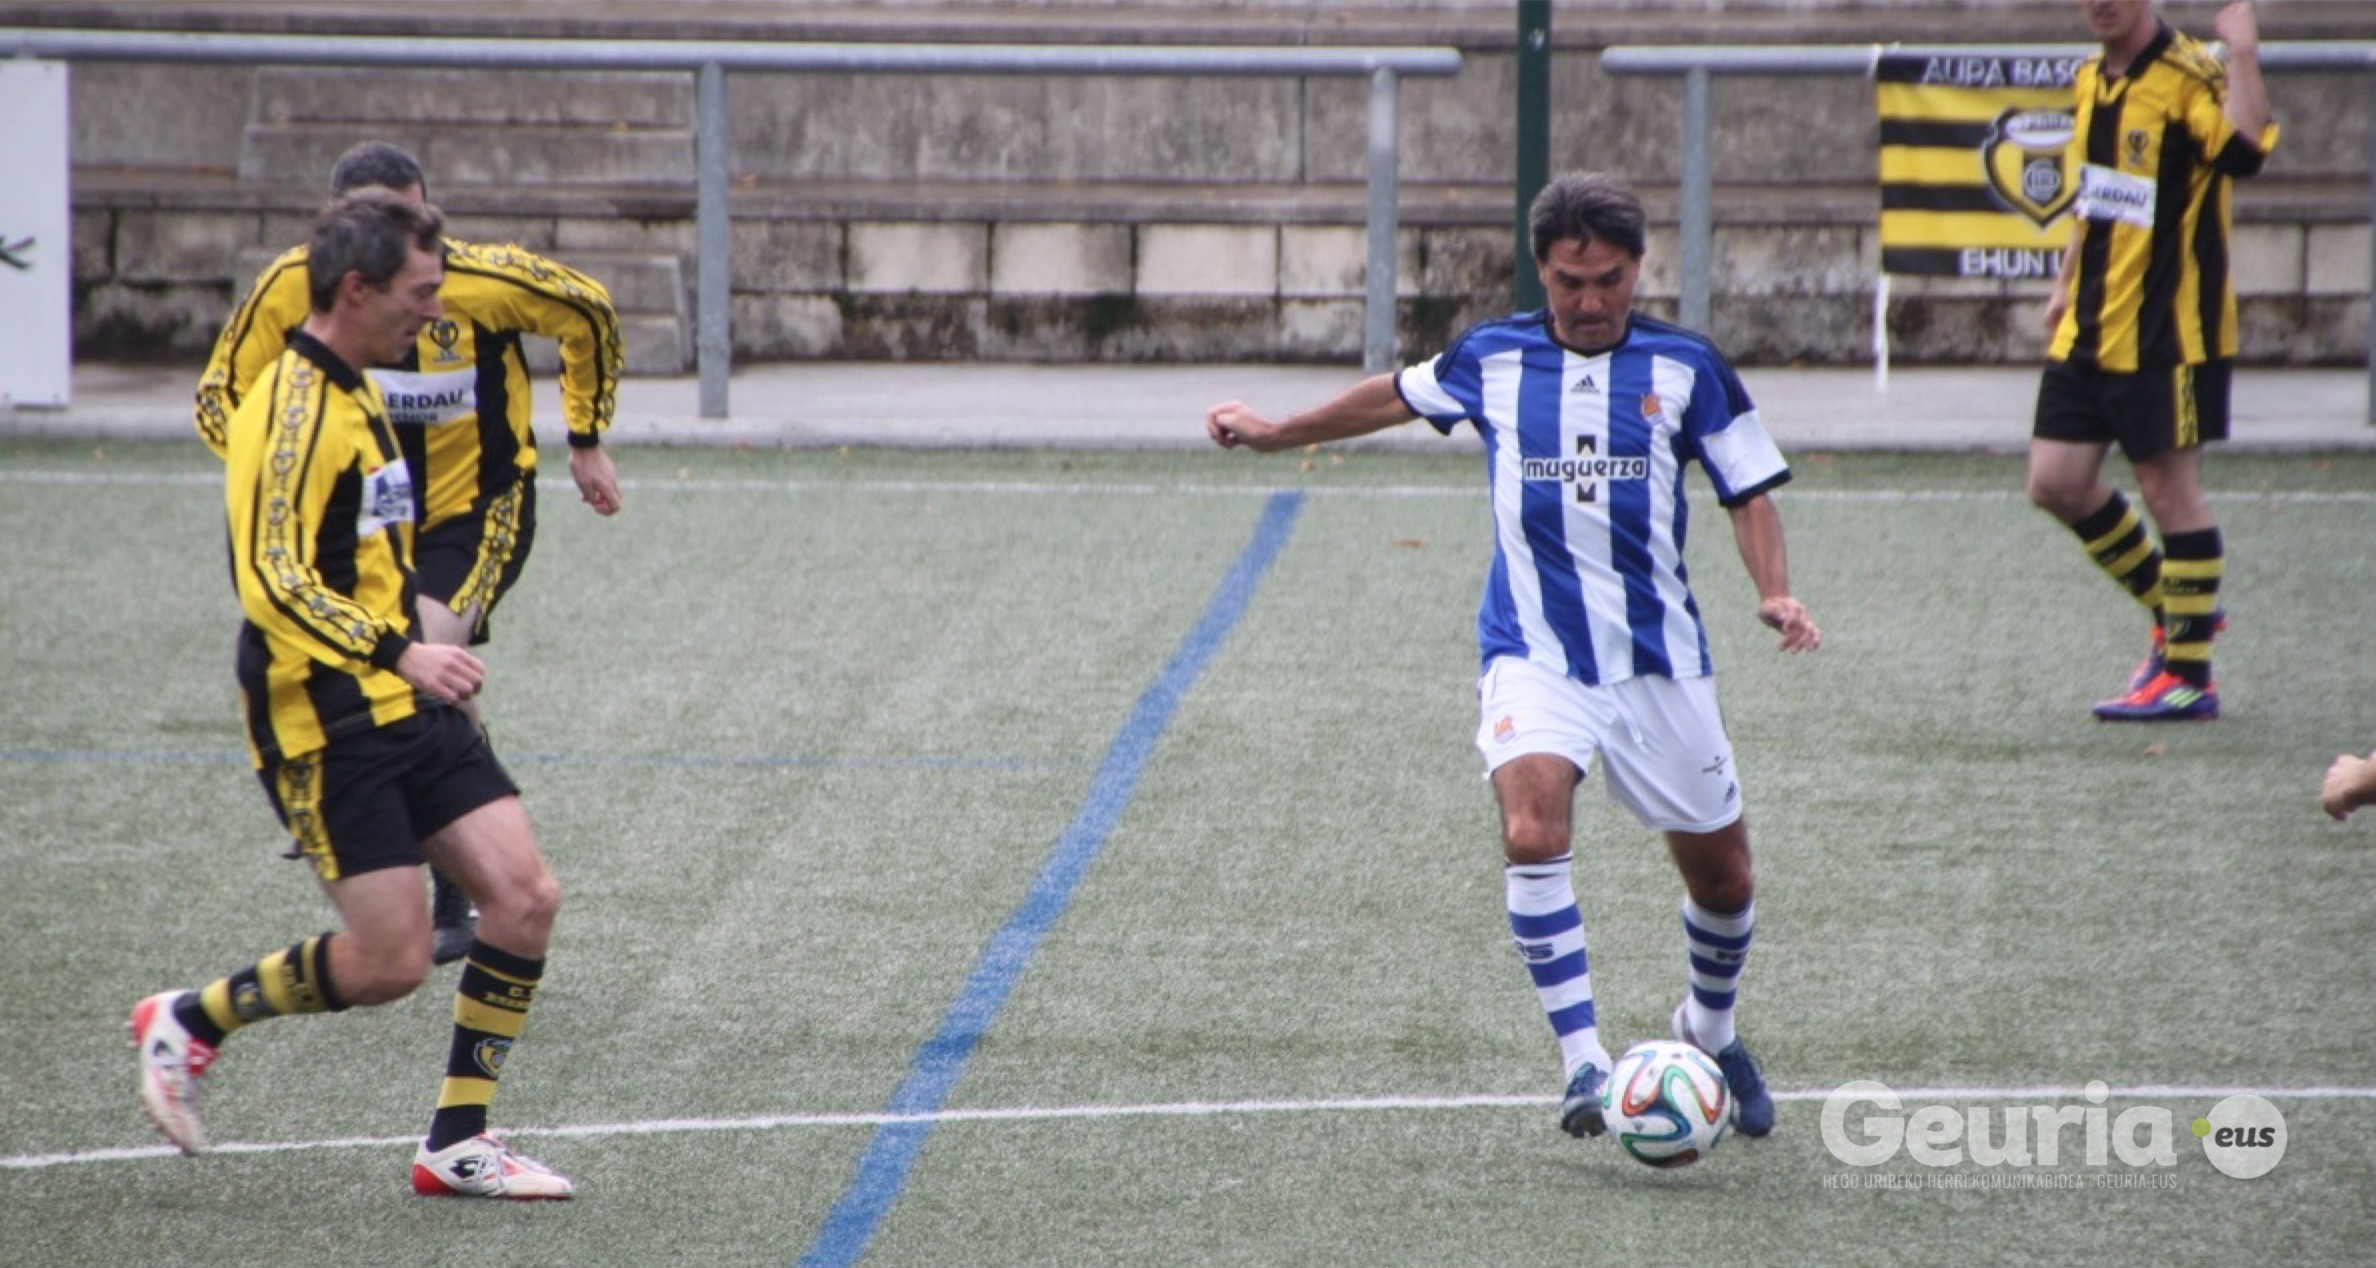 basauri_san_fausto_2015_futbol_basconia_beteranoak_10